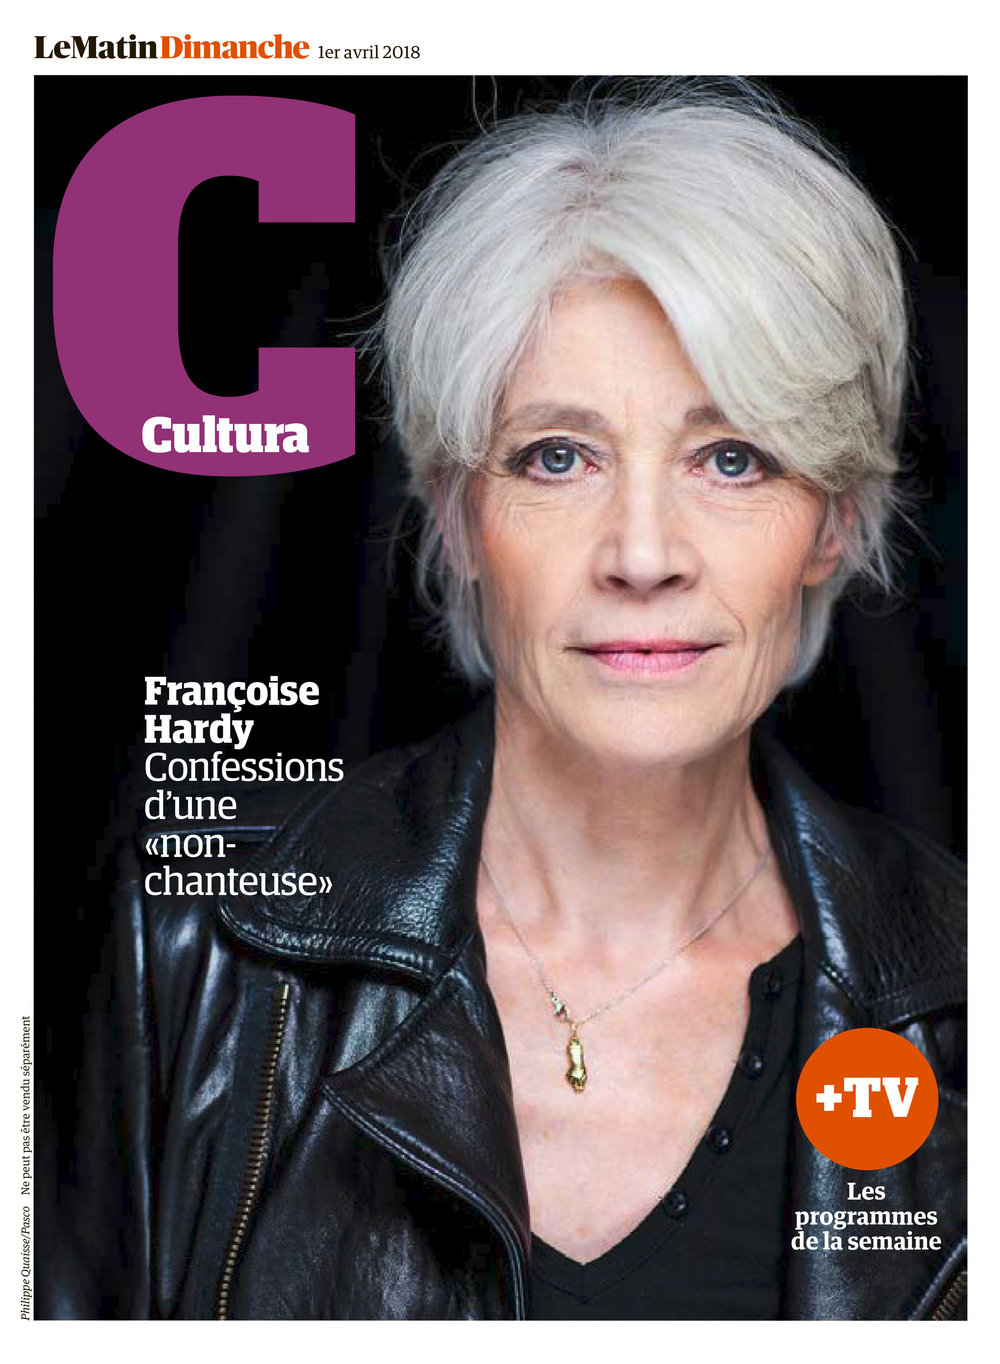 cultura - Cultura, das Kulturmagazin von Le Matin Dimanche. Teil des TVTop-Combis